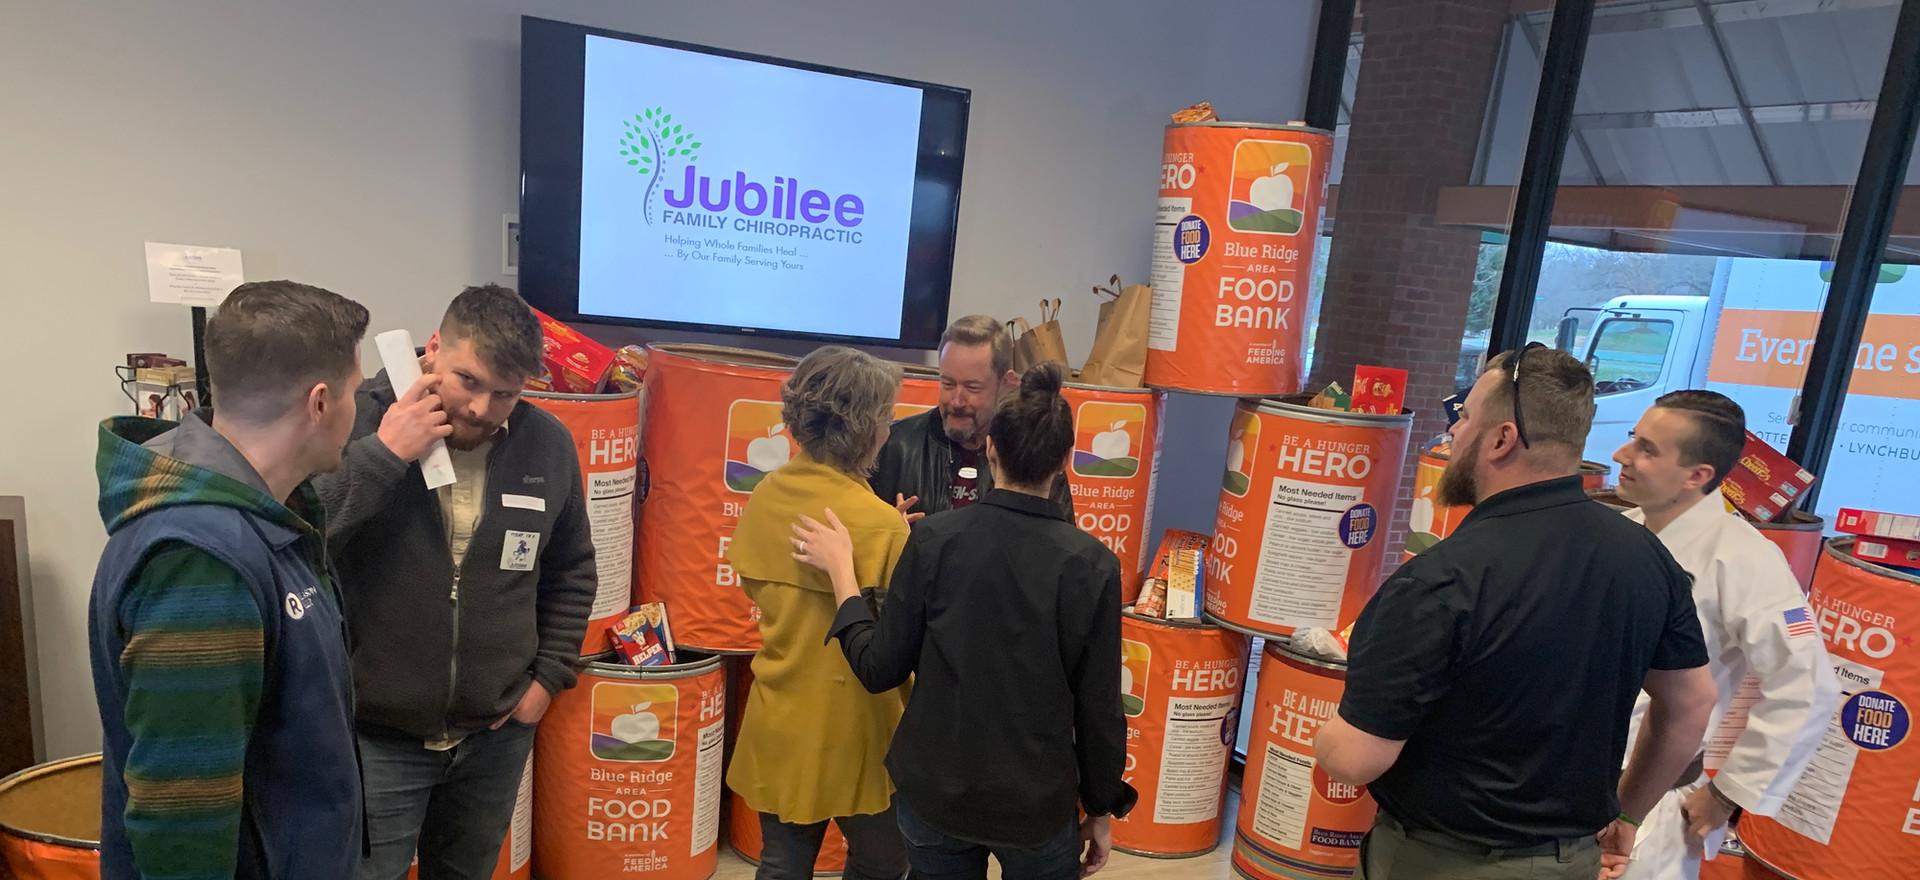 Jubilee Family Chiropractic 2020 Blue Ridge Food Drive. 035